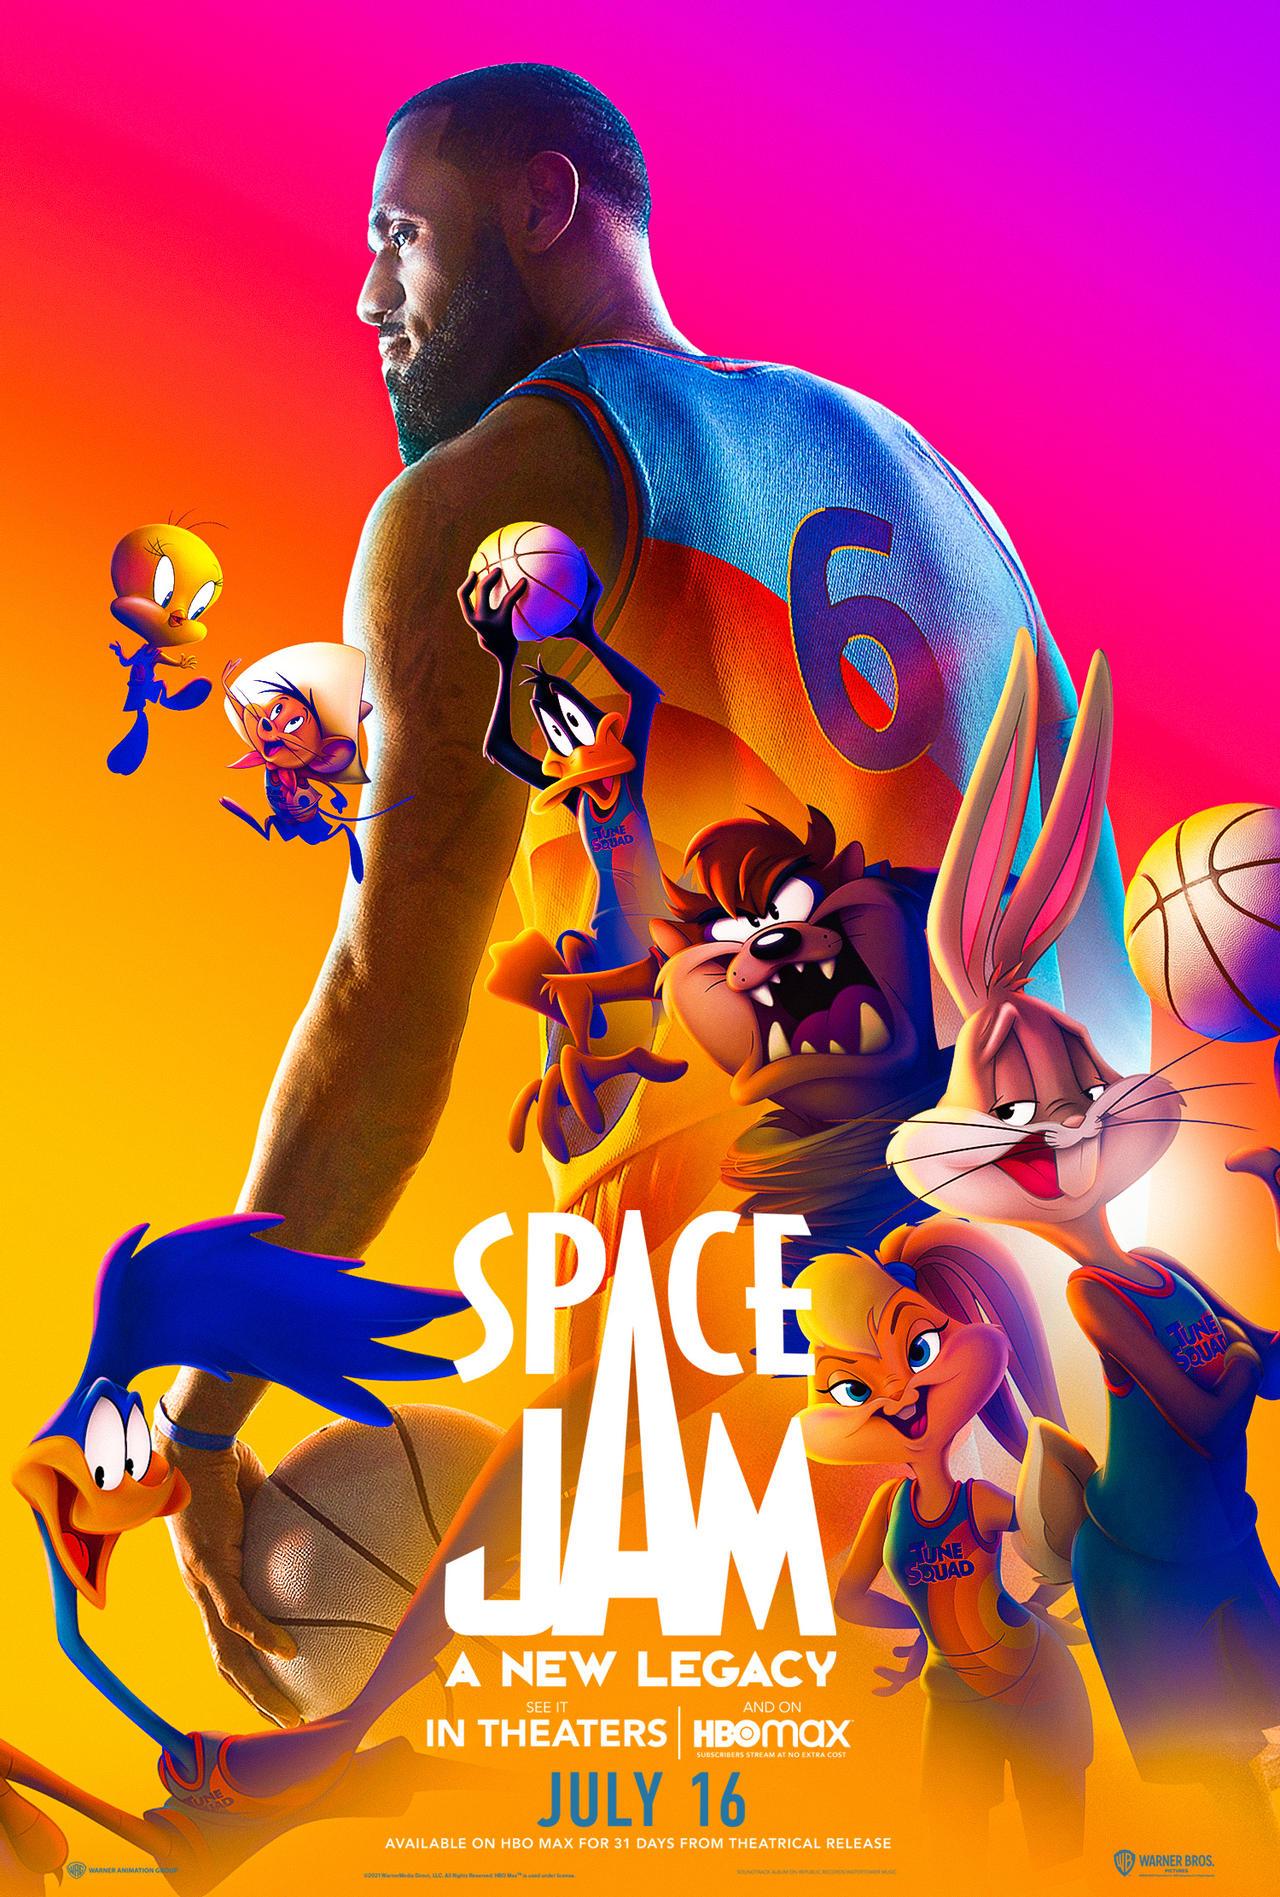 Space Jam: Kỷ Nguyên Mới - Space Jam: A New Legacy